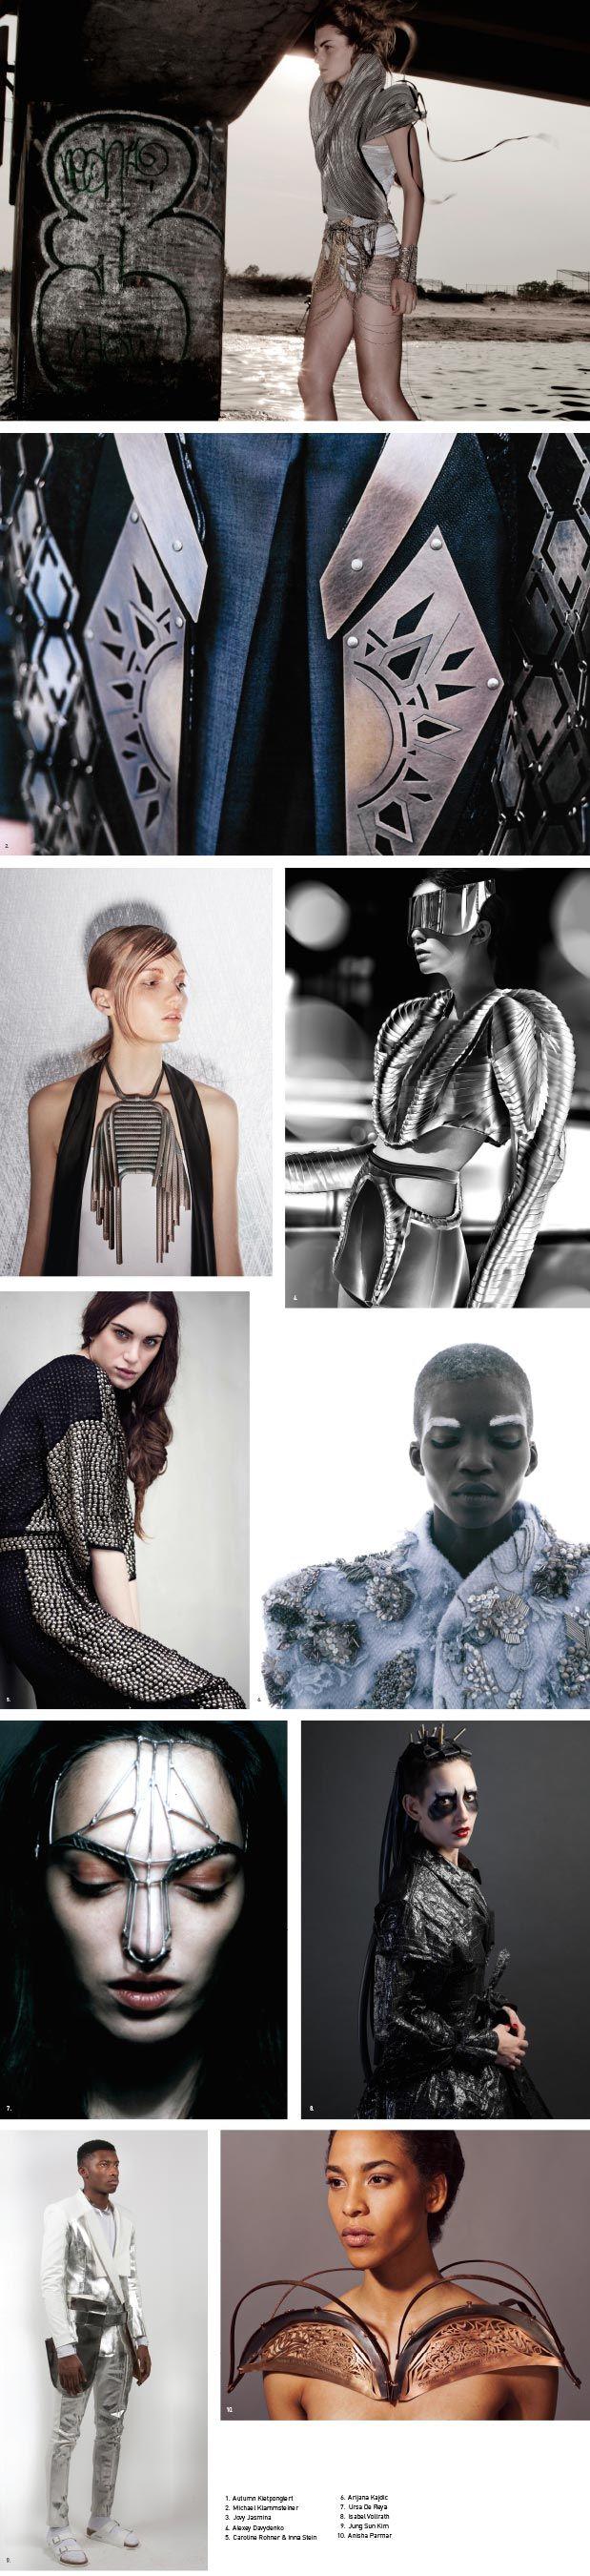 Future fashion trends 2014 - Trends Report Space Labfashion Forecastingmilitary Fashionfemale Clothing2014 Trendsfuture